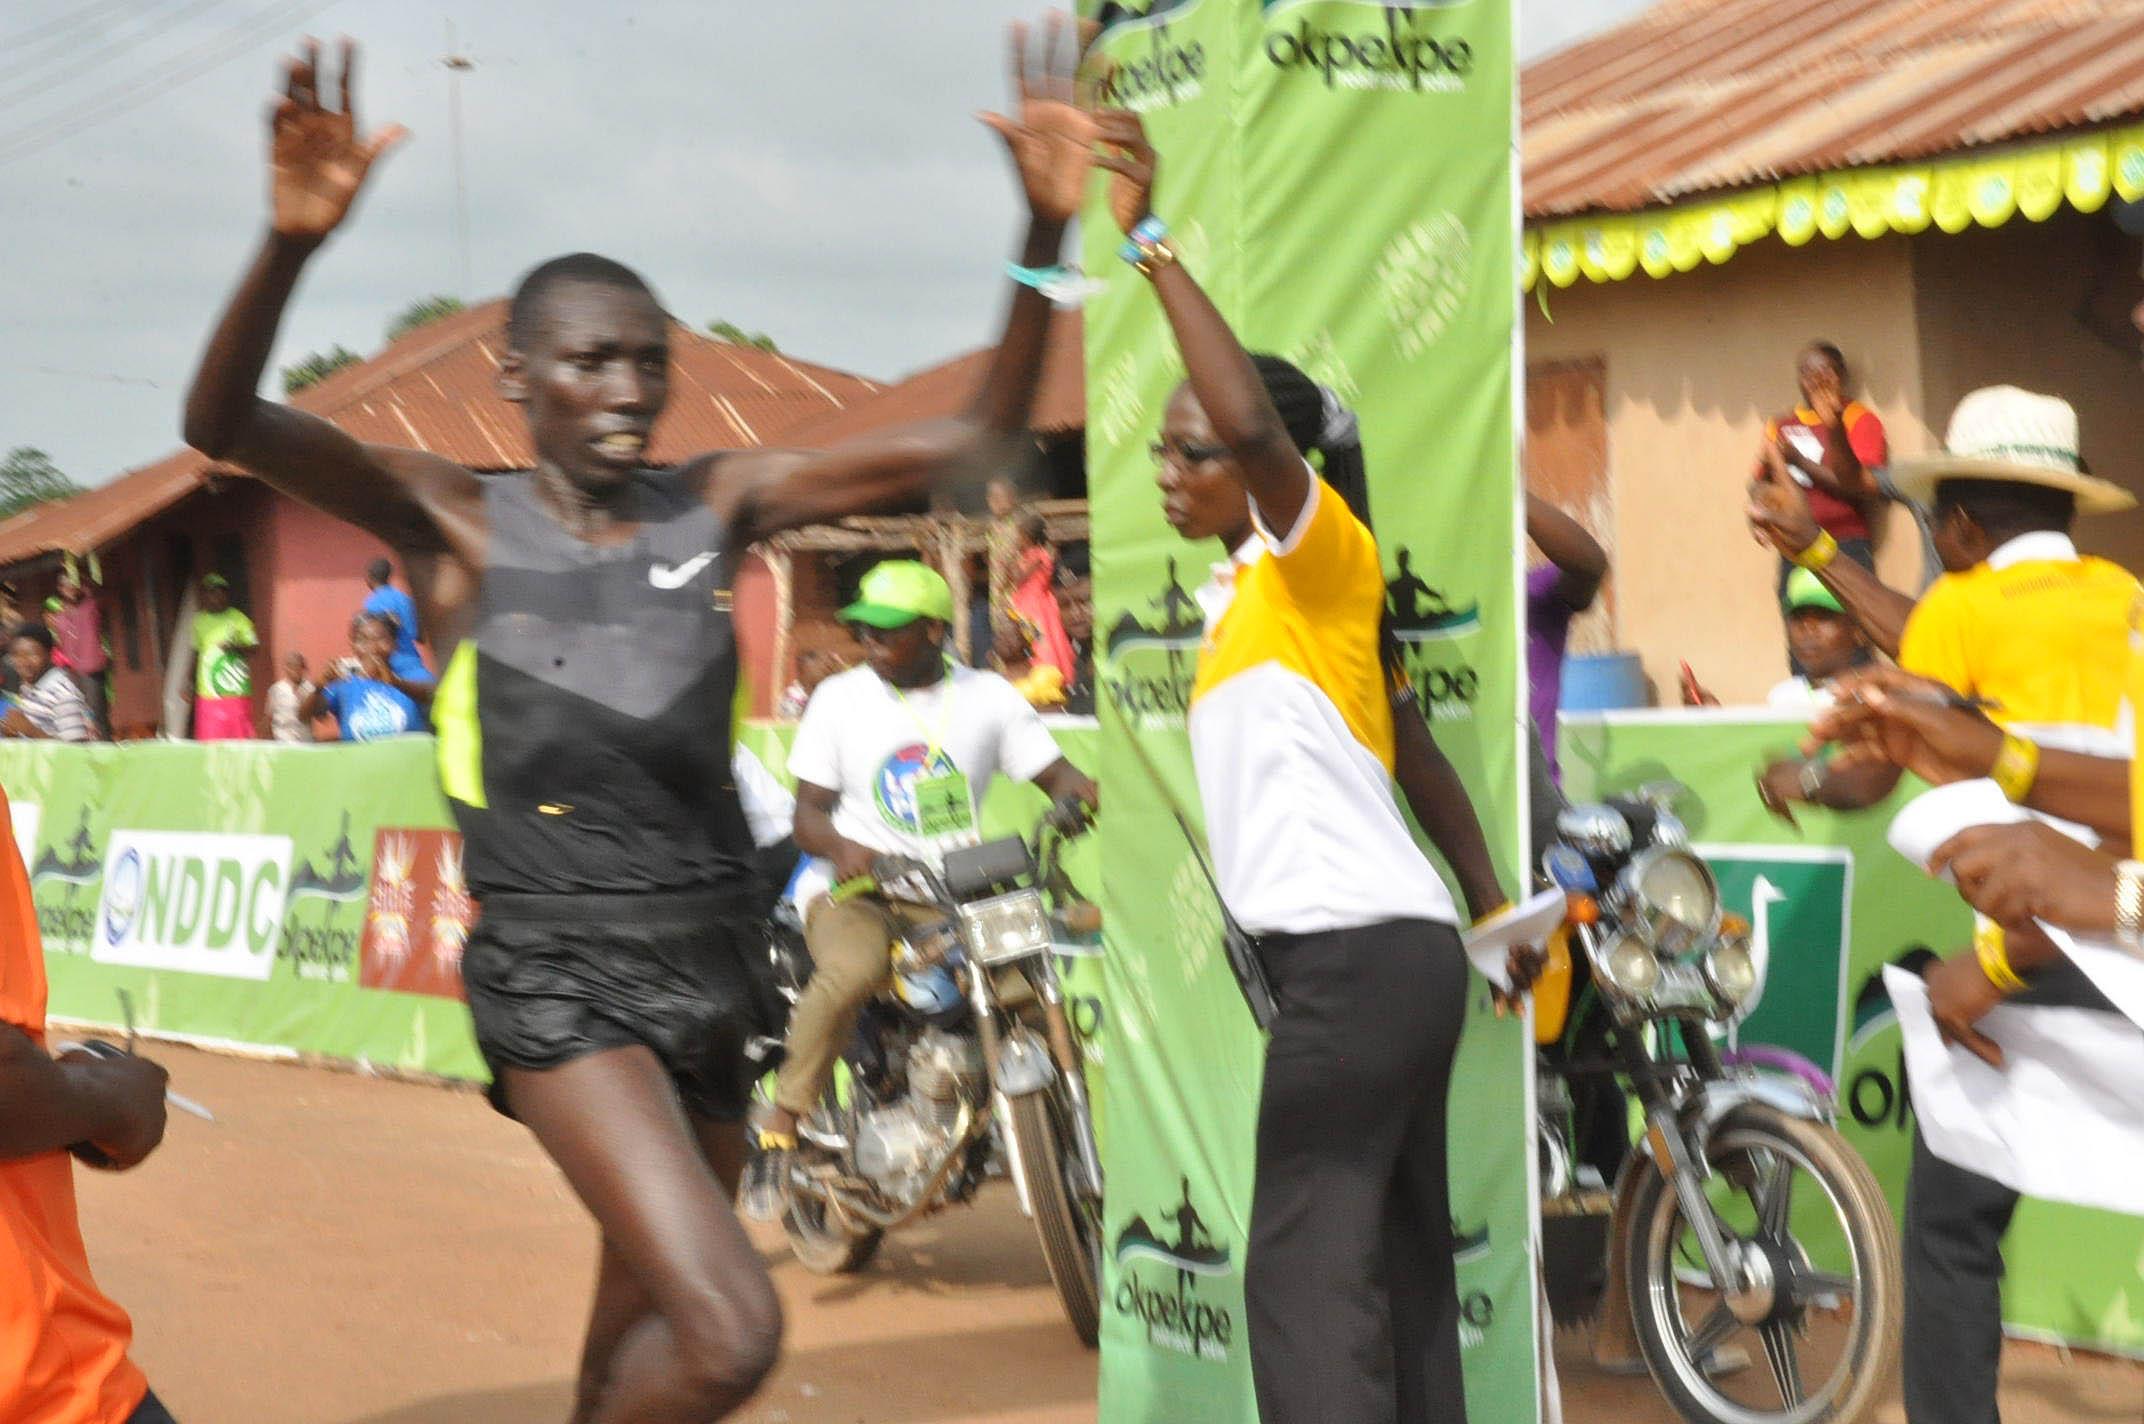 Screening,accreditation begin for Okpekpe Race